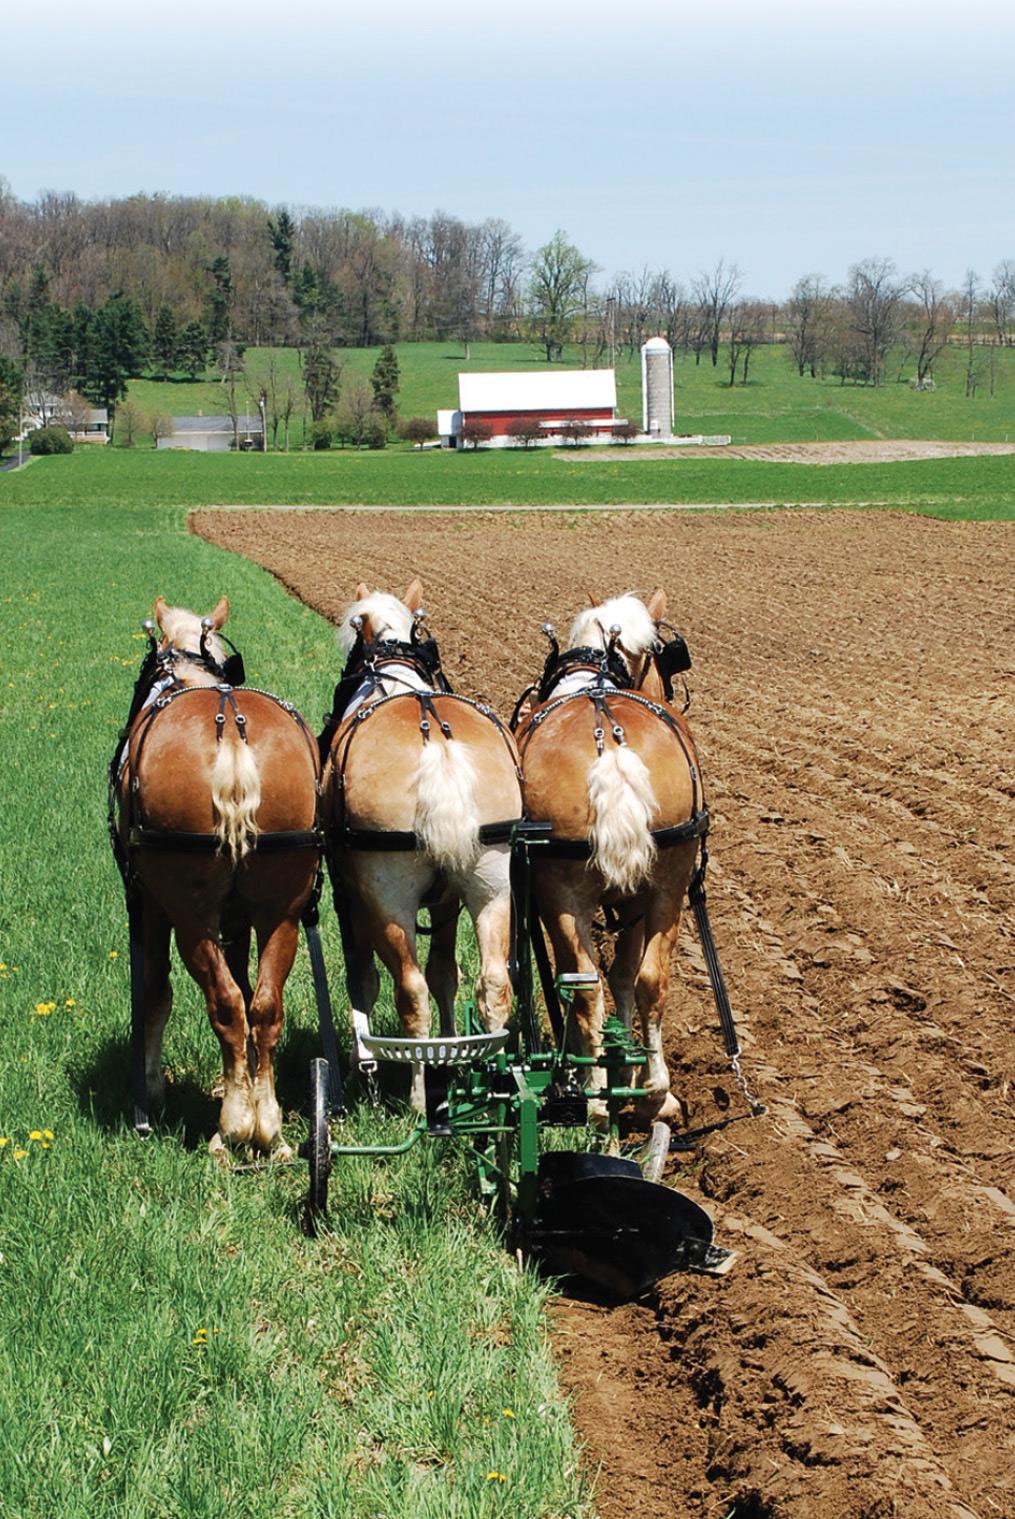 Pioneer Plowing with 3 horse team